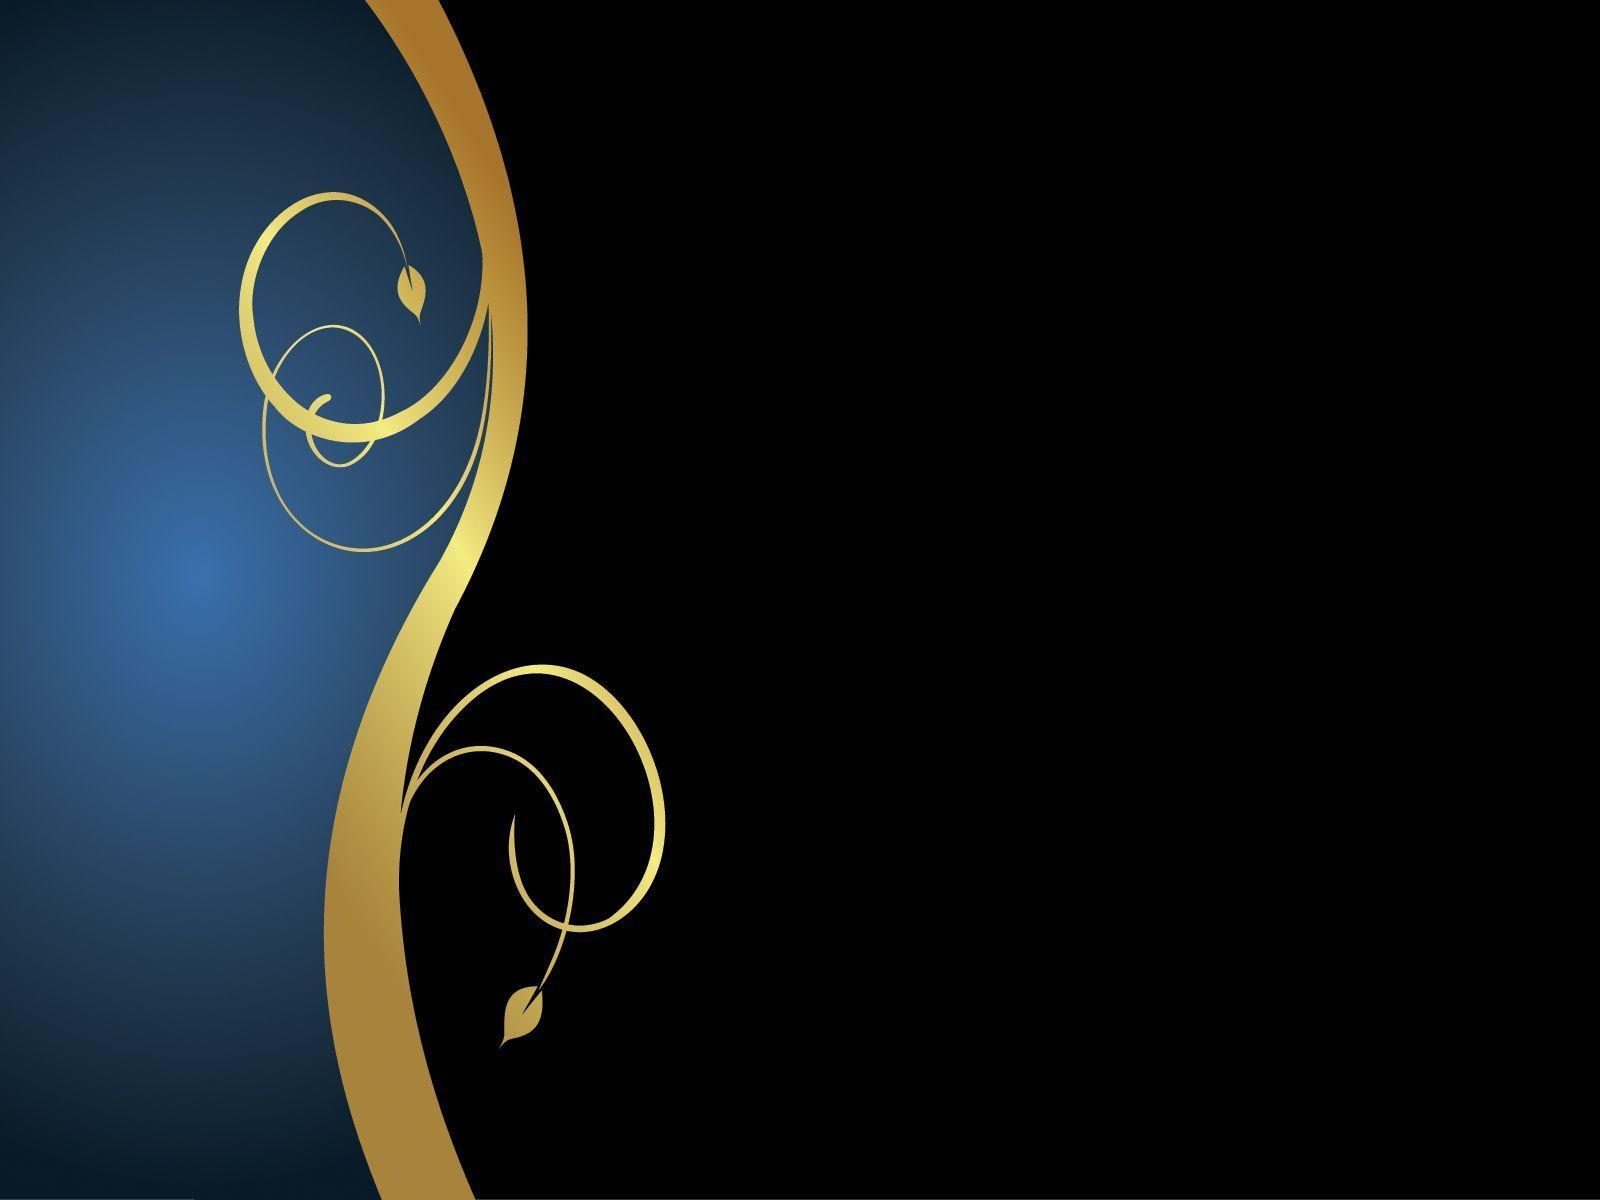 Scrapbook ideas black background - Explore Blue Gold Invitation Ideas And More